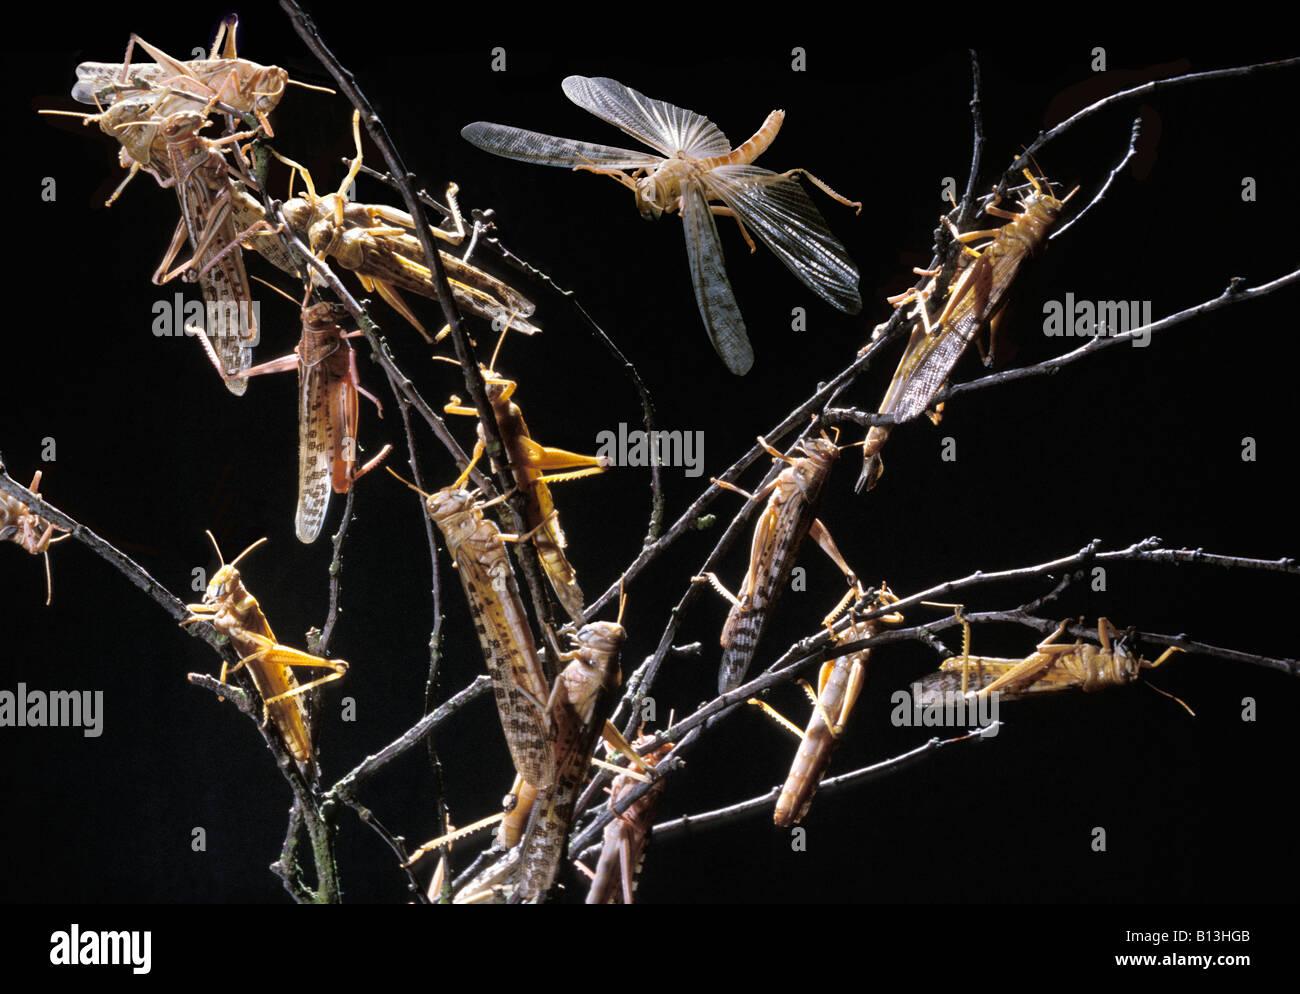 criquet migrateur Wanderheuschrecke Migratory Locust Locusta migratoria feeding swarm animals Arthropoda arthropods - Stock Image